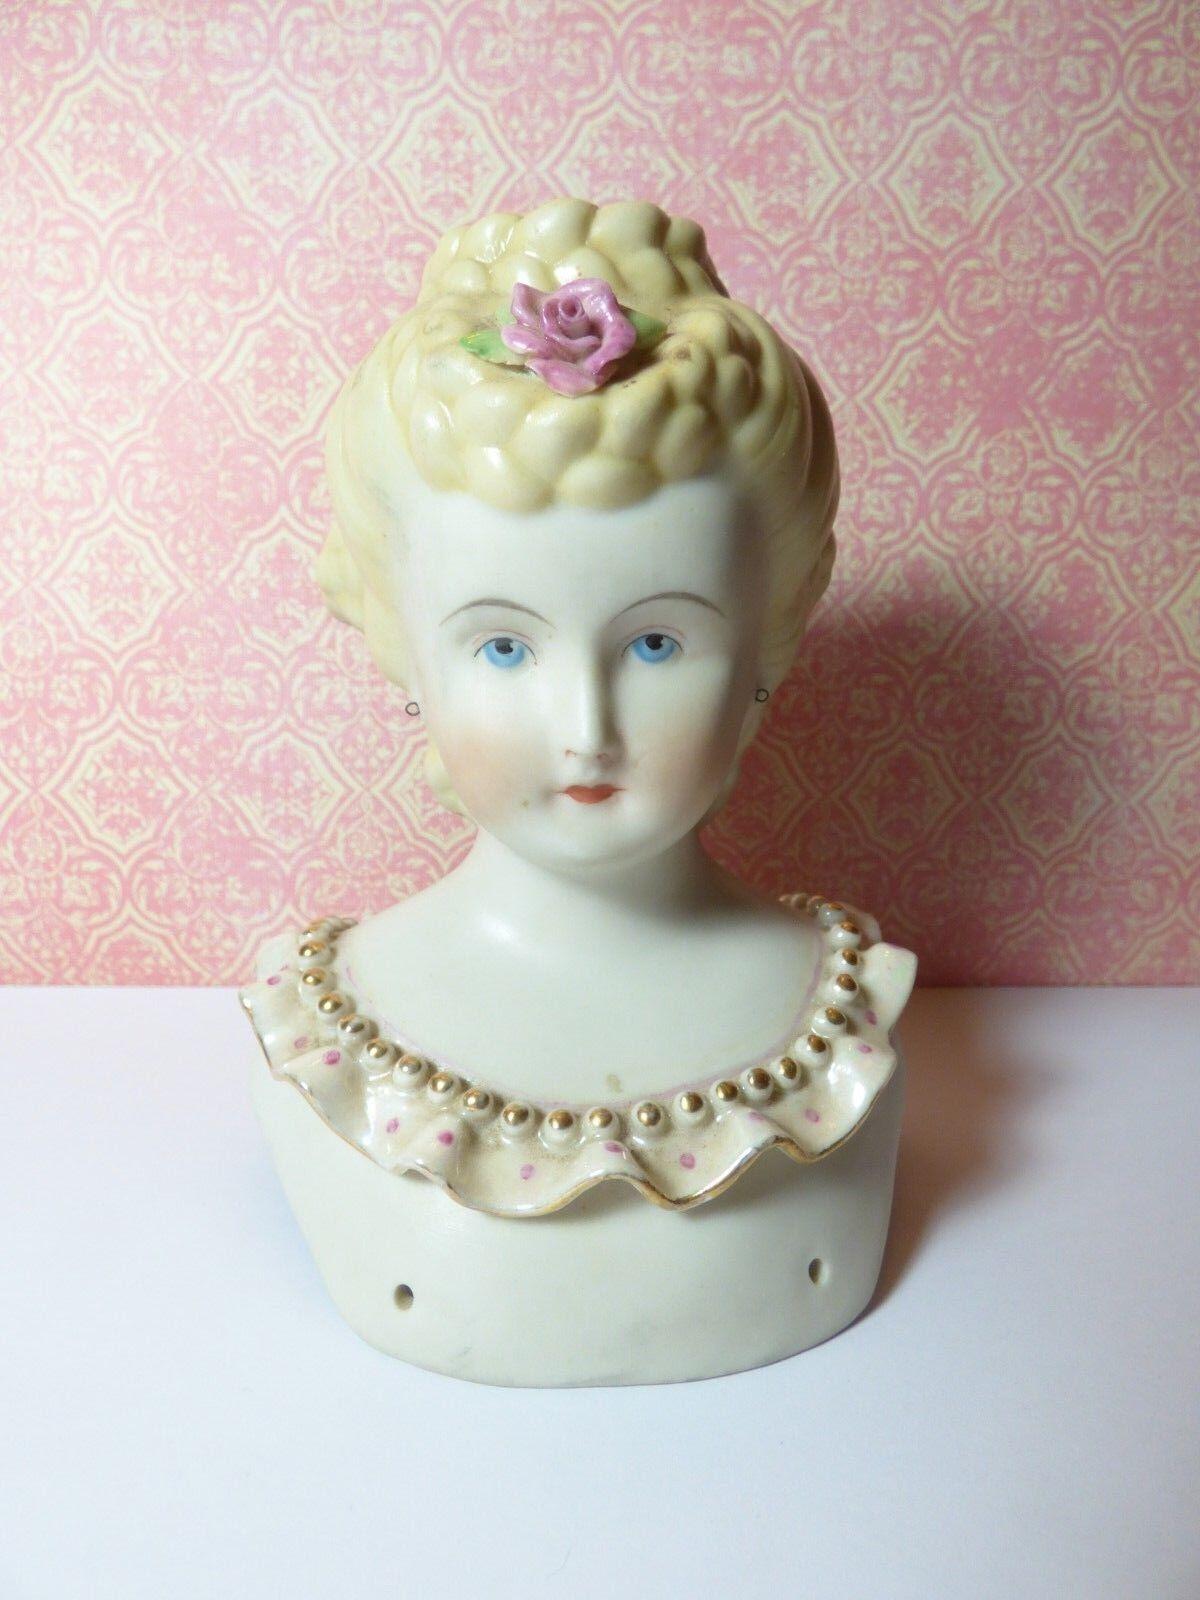 RARE 5  Blonde Updo EMMA CLEAR 1945 Bisque Porcelain Parian Doll Shoulder HEAD